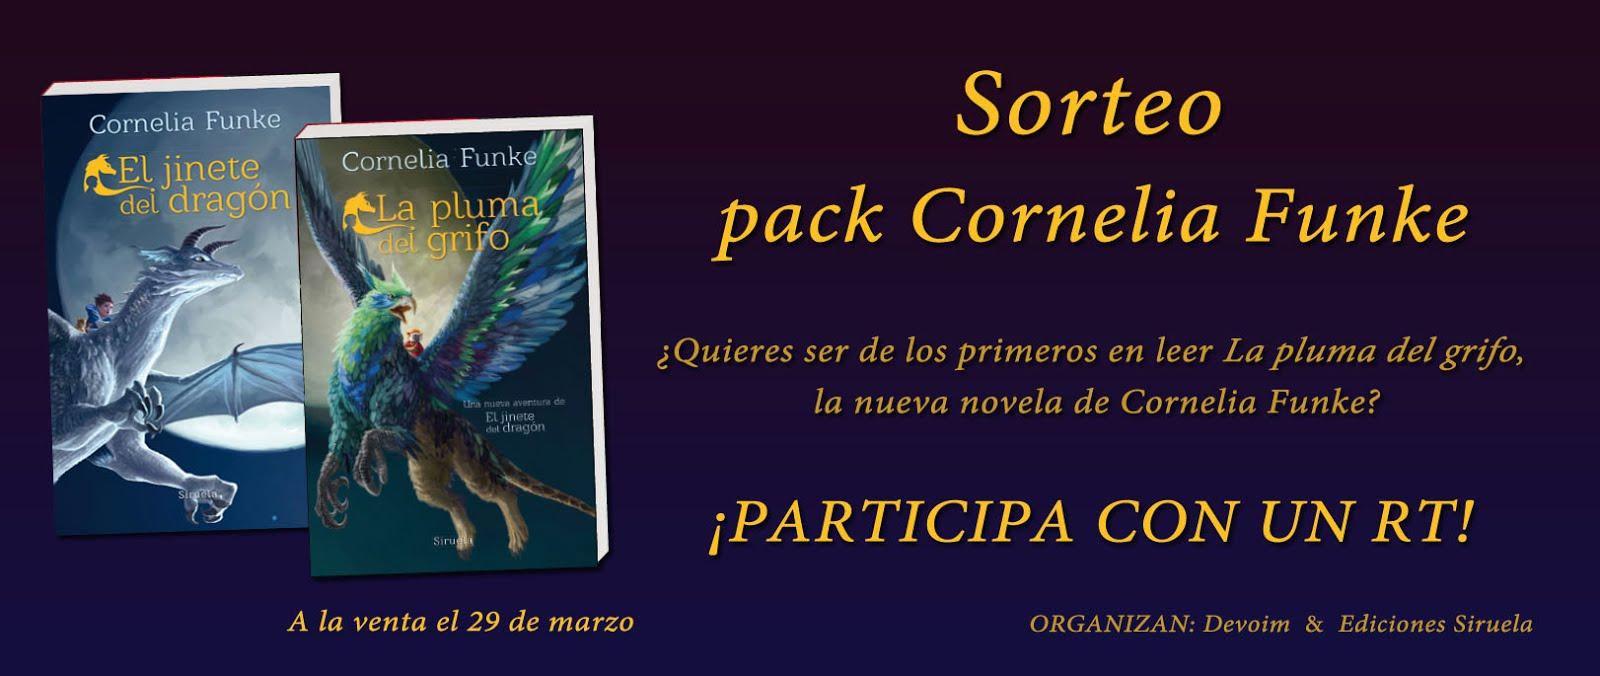 Sorteo Pack Cornelia Funke [El jinete del dragón + La pluma del grifo]